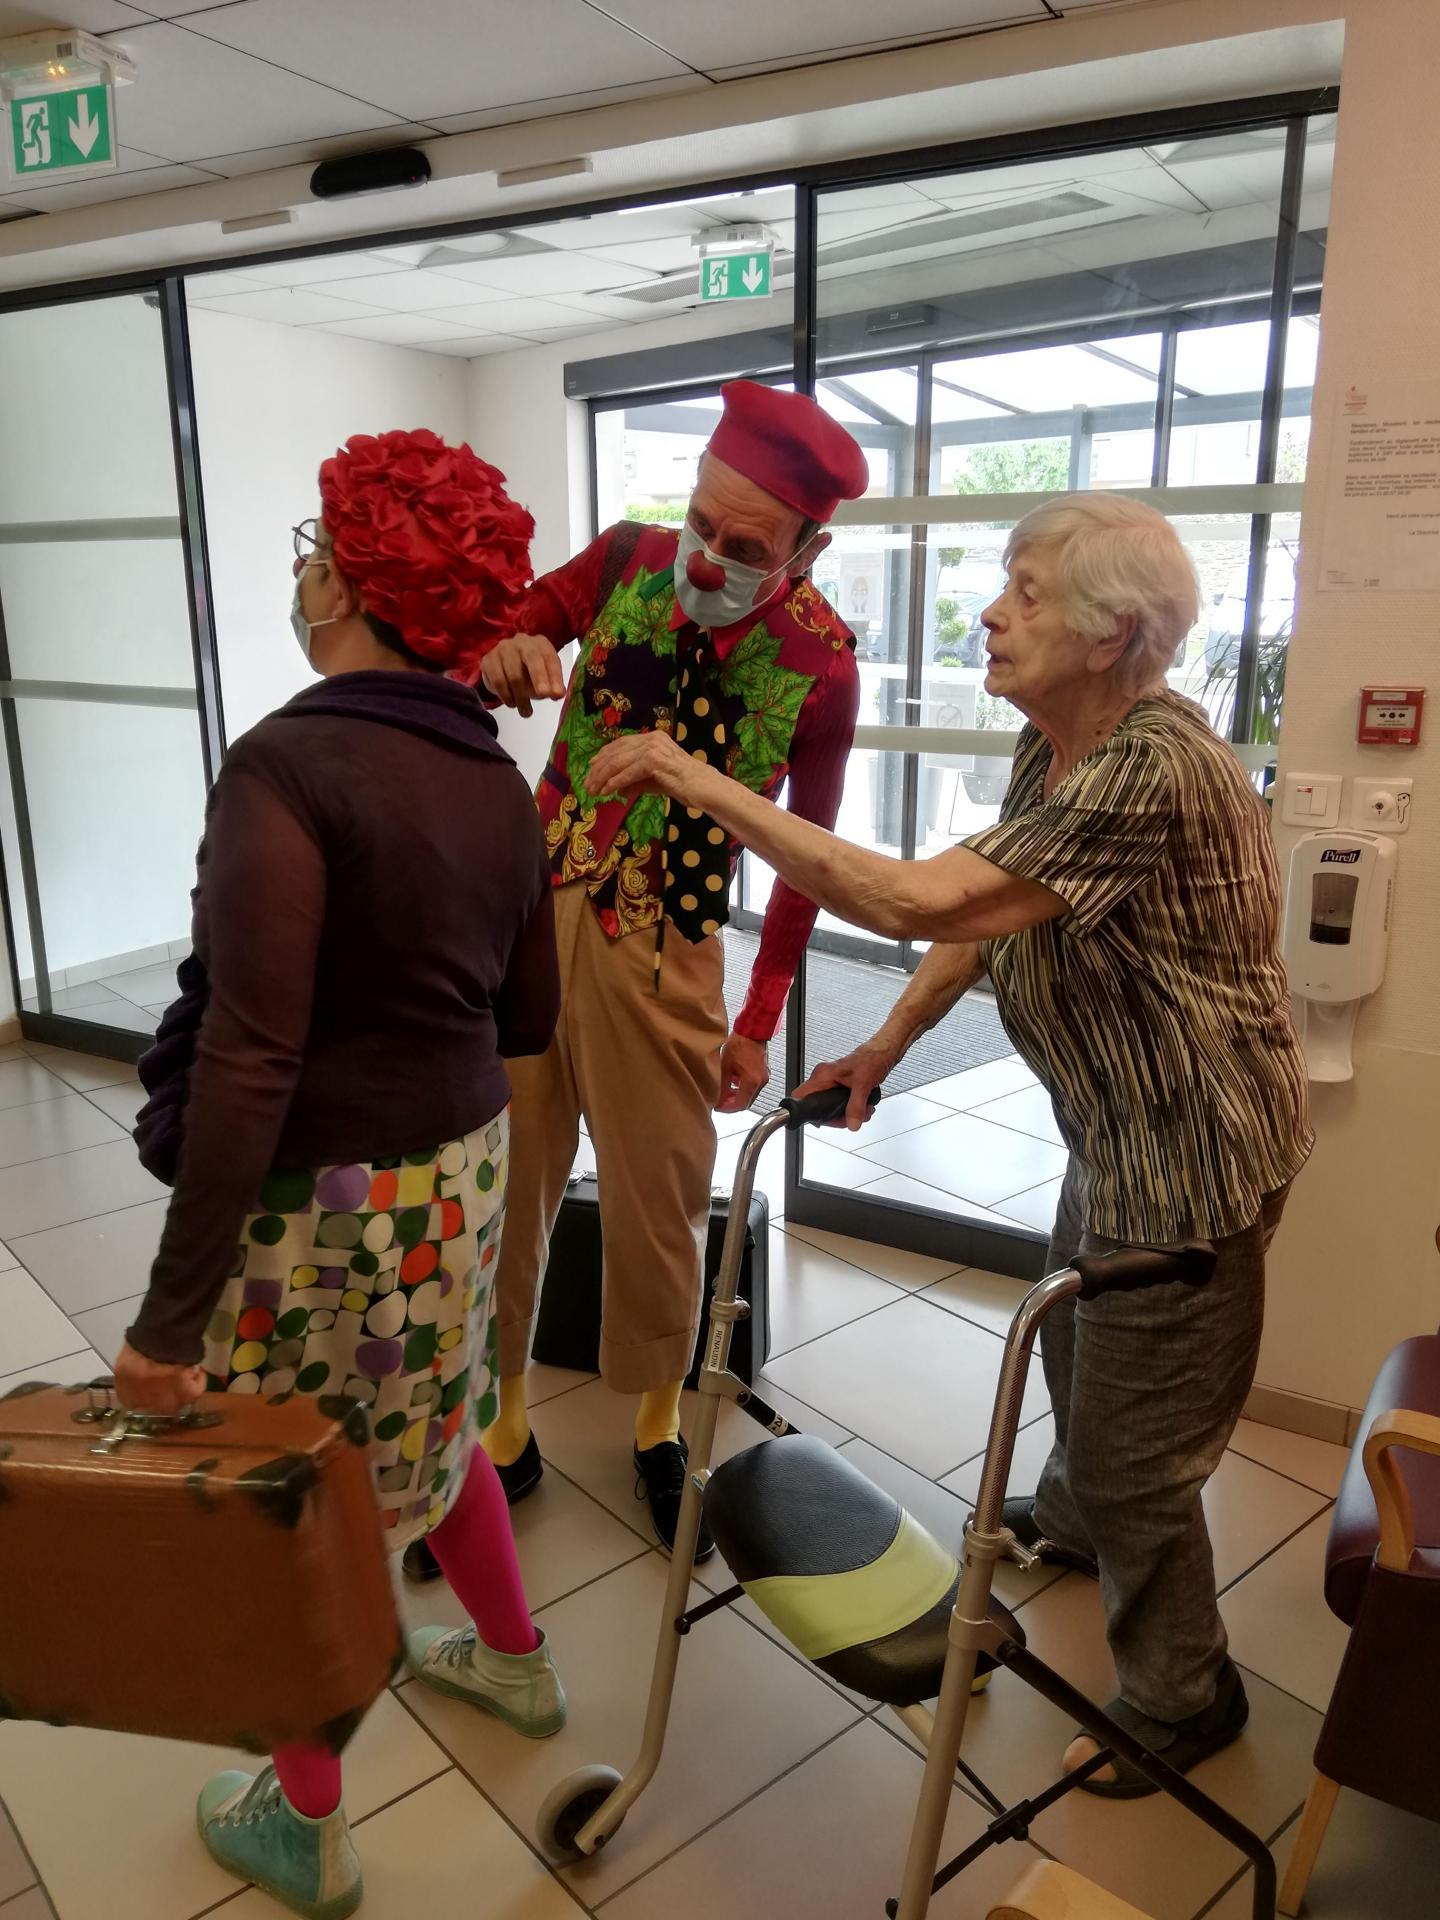 Clowns en milieu de soins